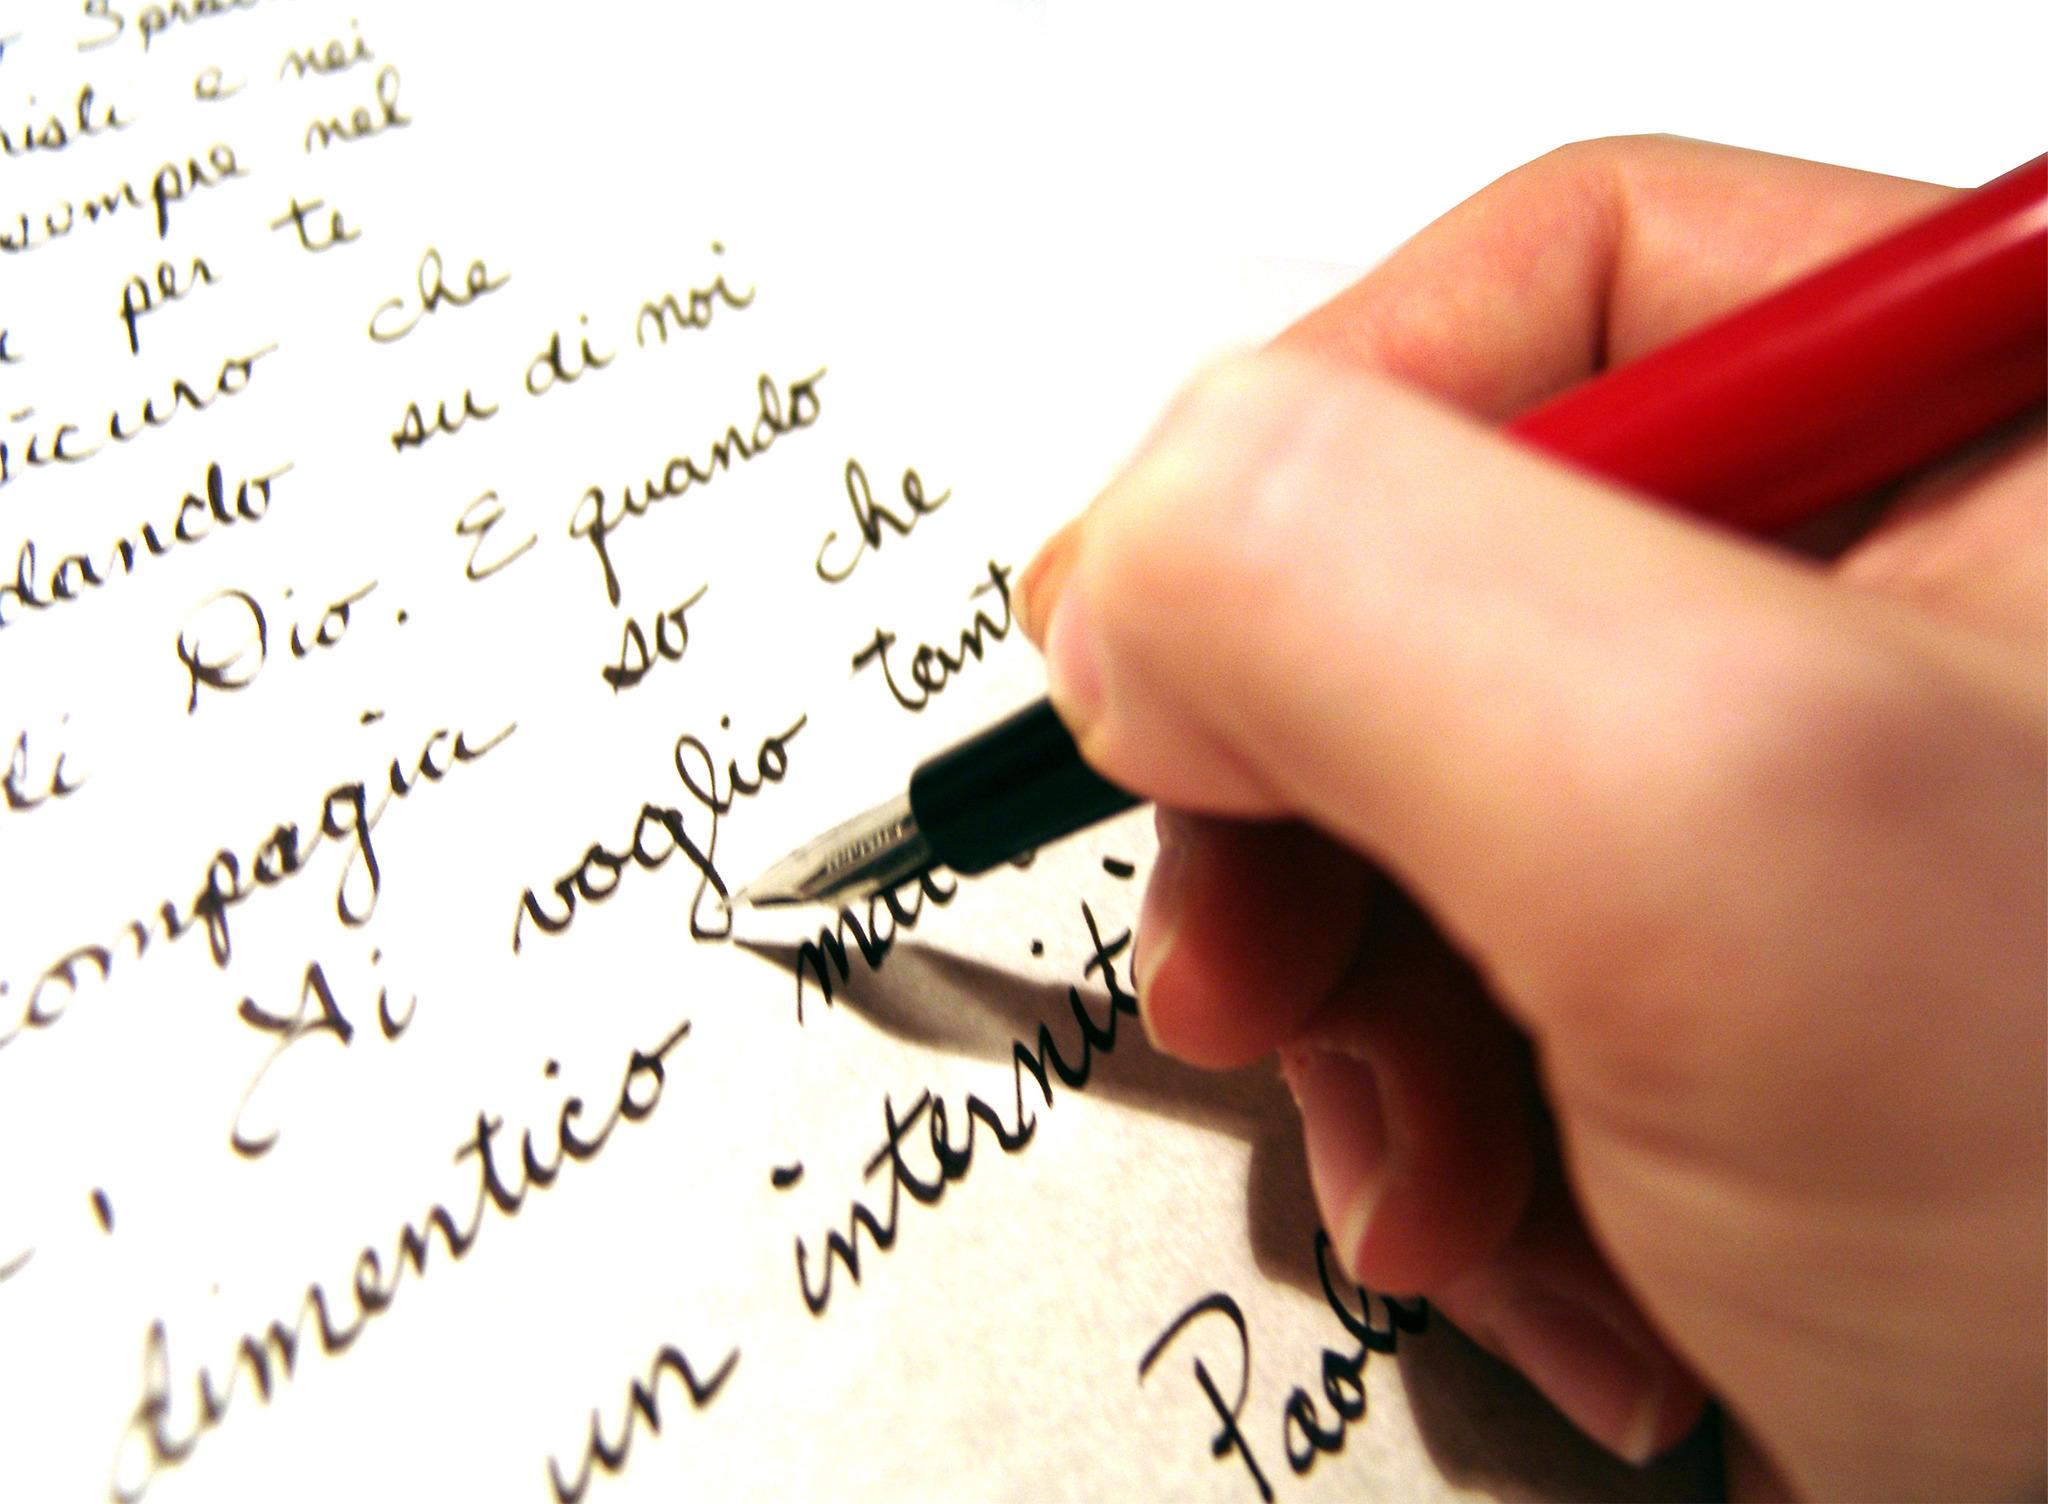 College application essay writing help tumblr